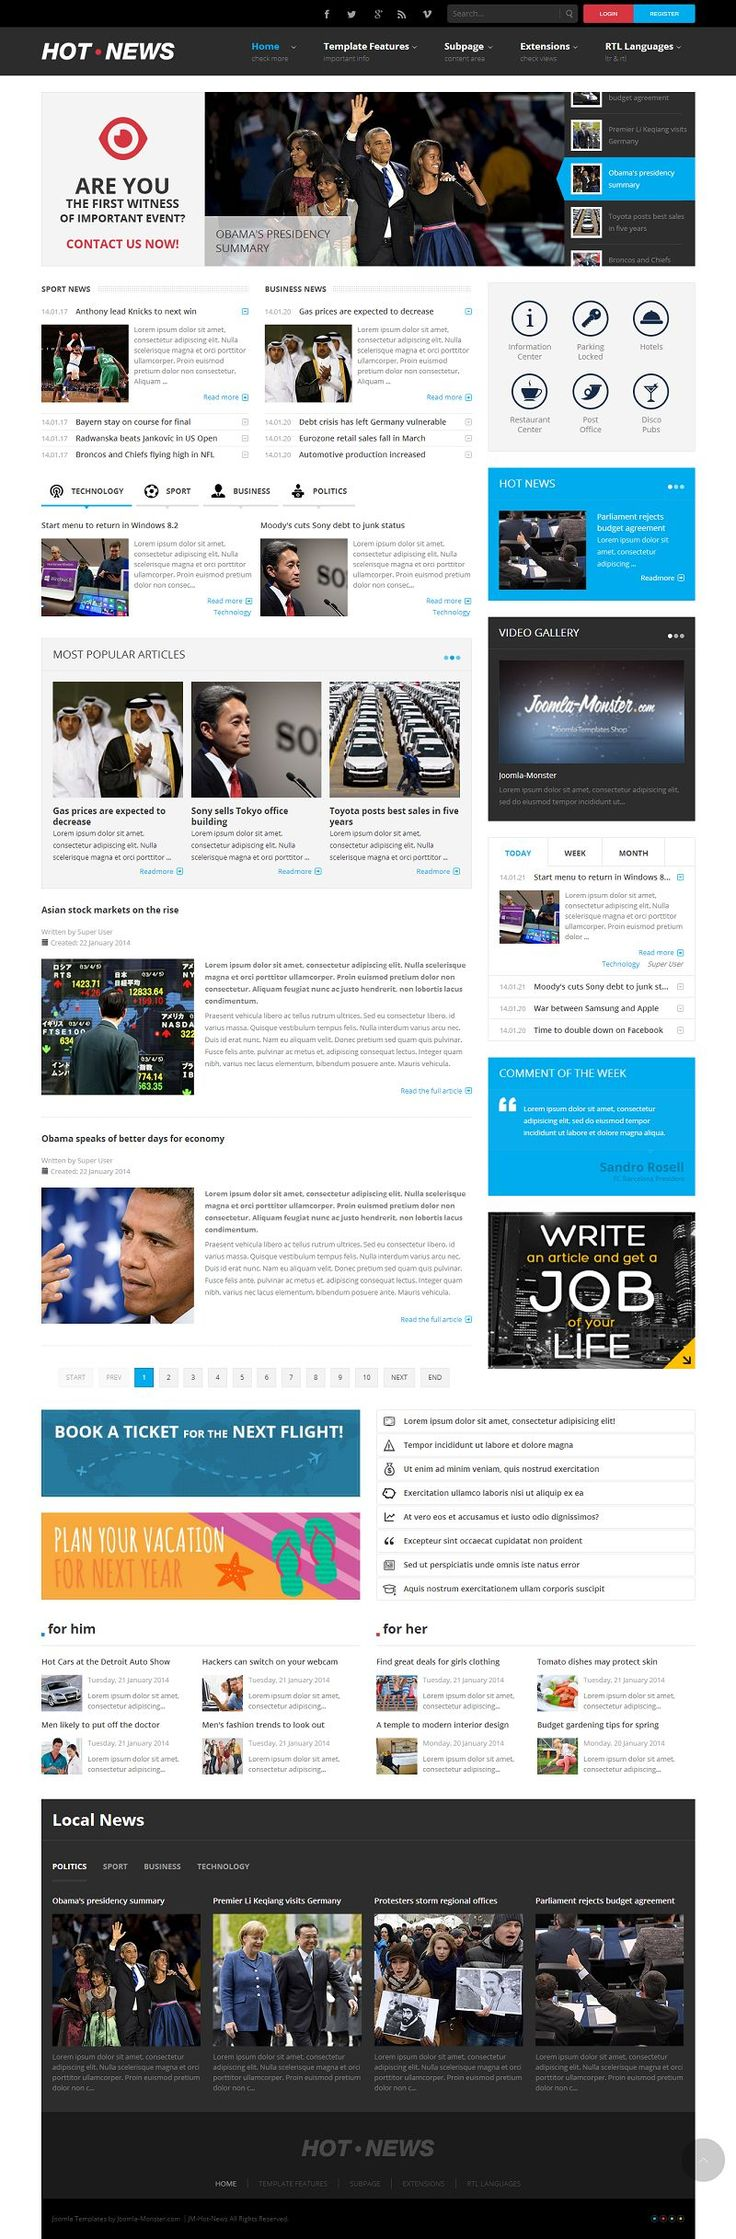 JM-Hot-News Responsive #Joomla Magazine Template http://www.themesandmods.com/joomla-templates/jm-hot-news/